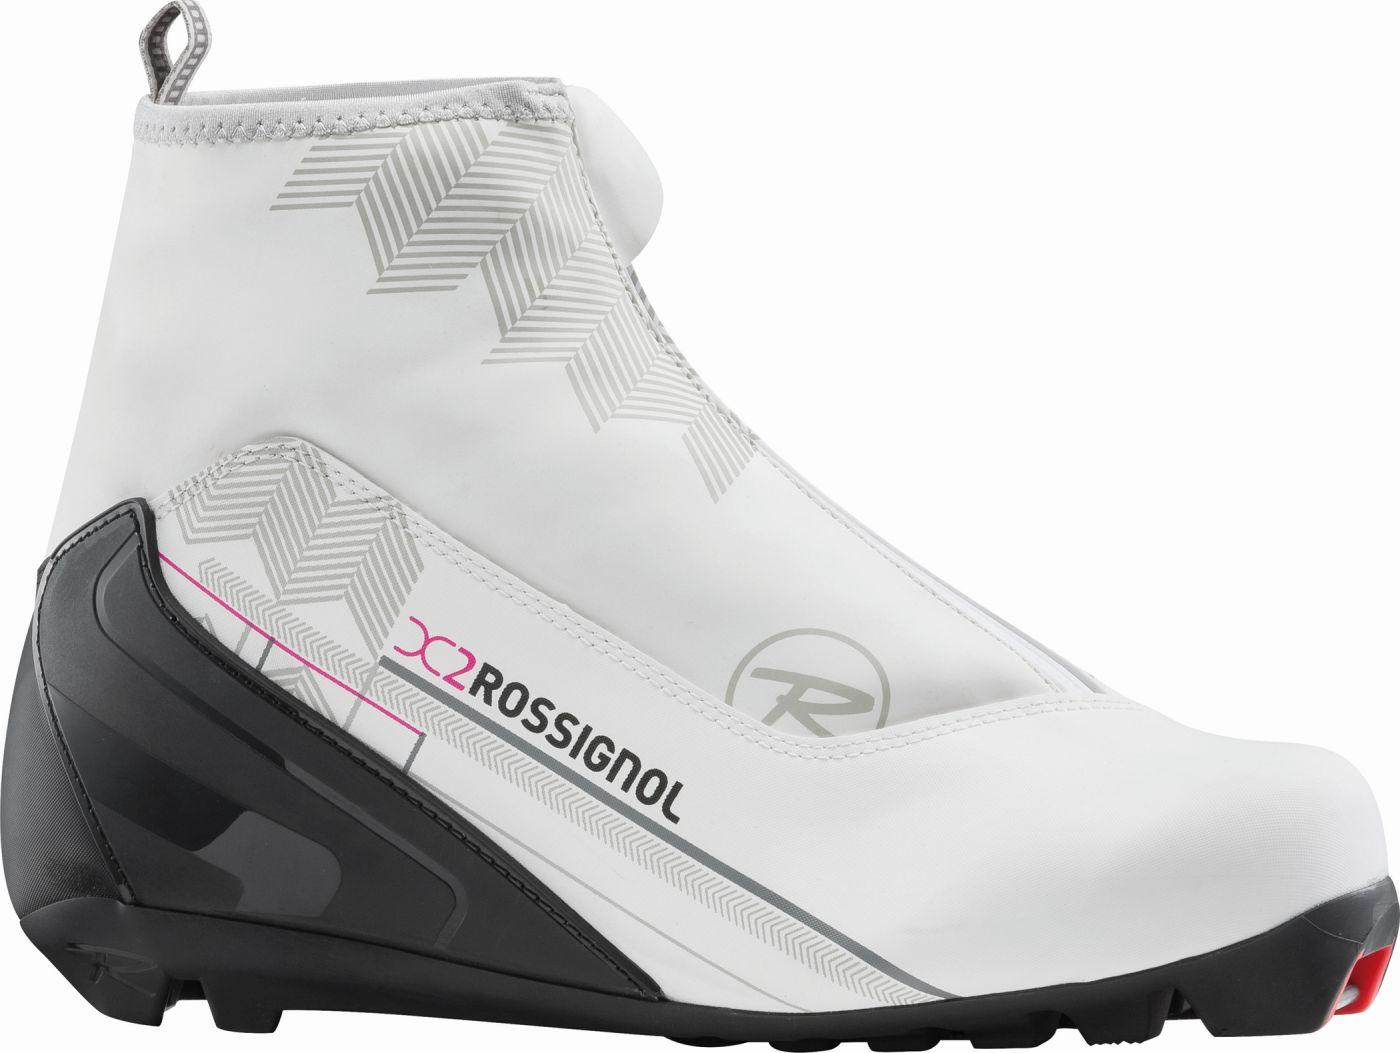 0237e330d0f9a Rossignol eshop - Bežecká obuv: X-2 FW